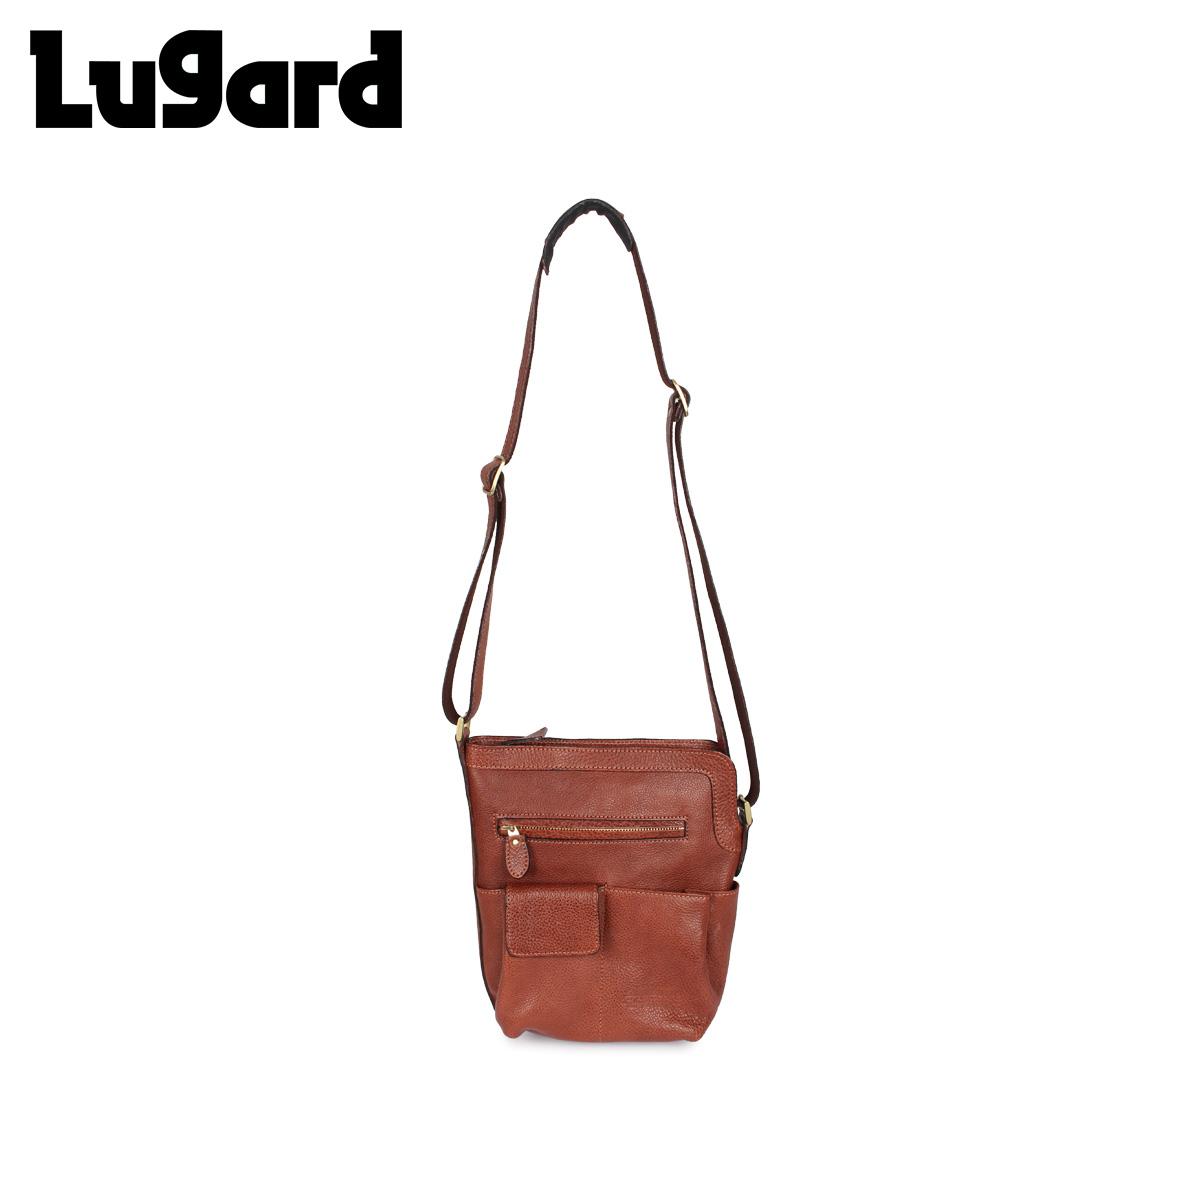 Lugard ラガード 青木鞄 バッグ ショルダーバッグ メンズ NEVADA BAG SHOULDER BAG ブラウン 5084